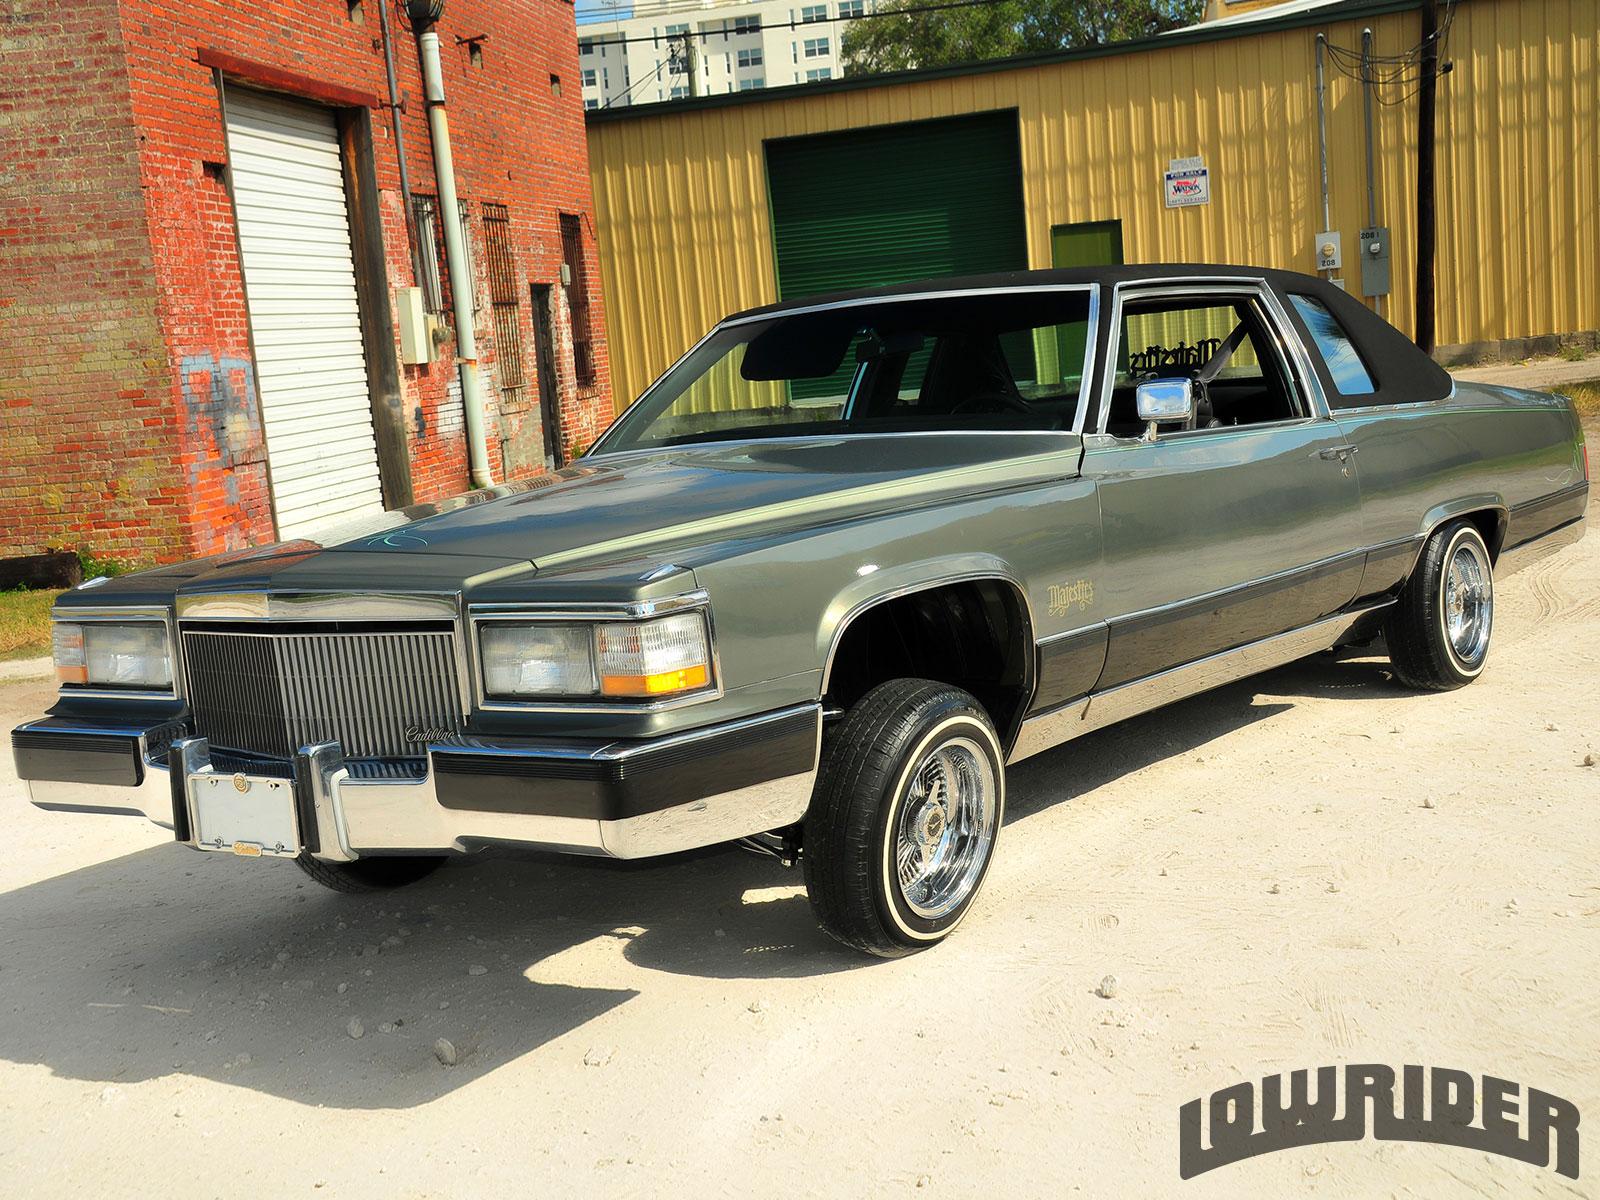 1977 Cadillac Deville - Lowrider Magazine